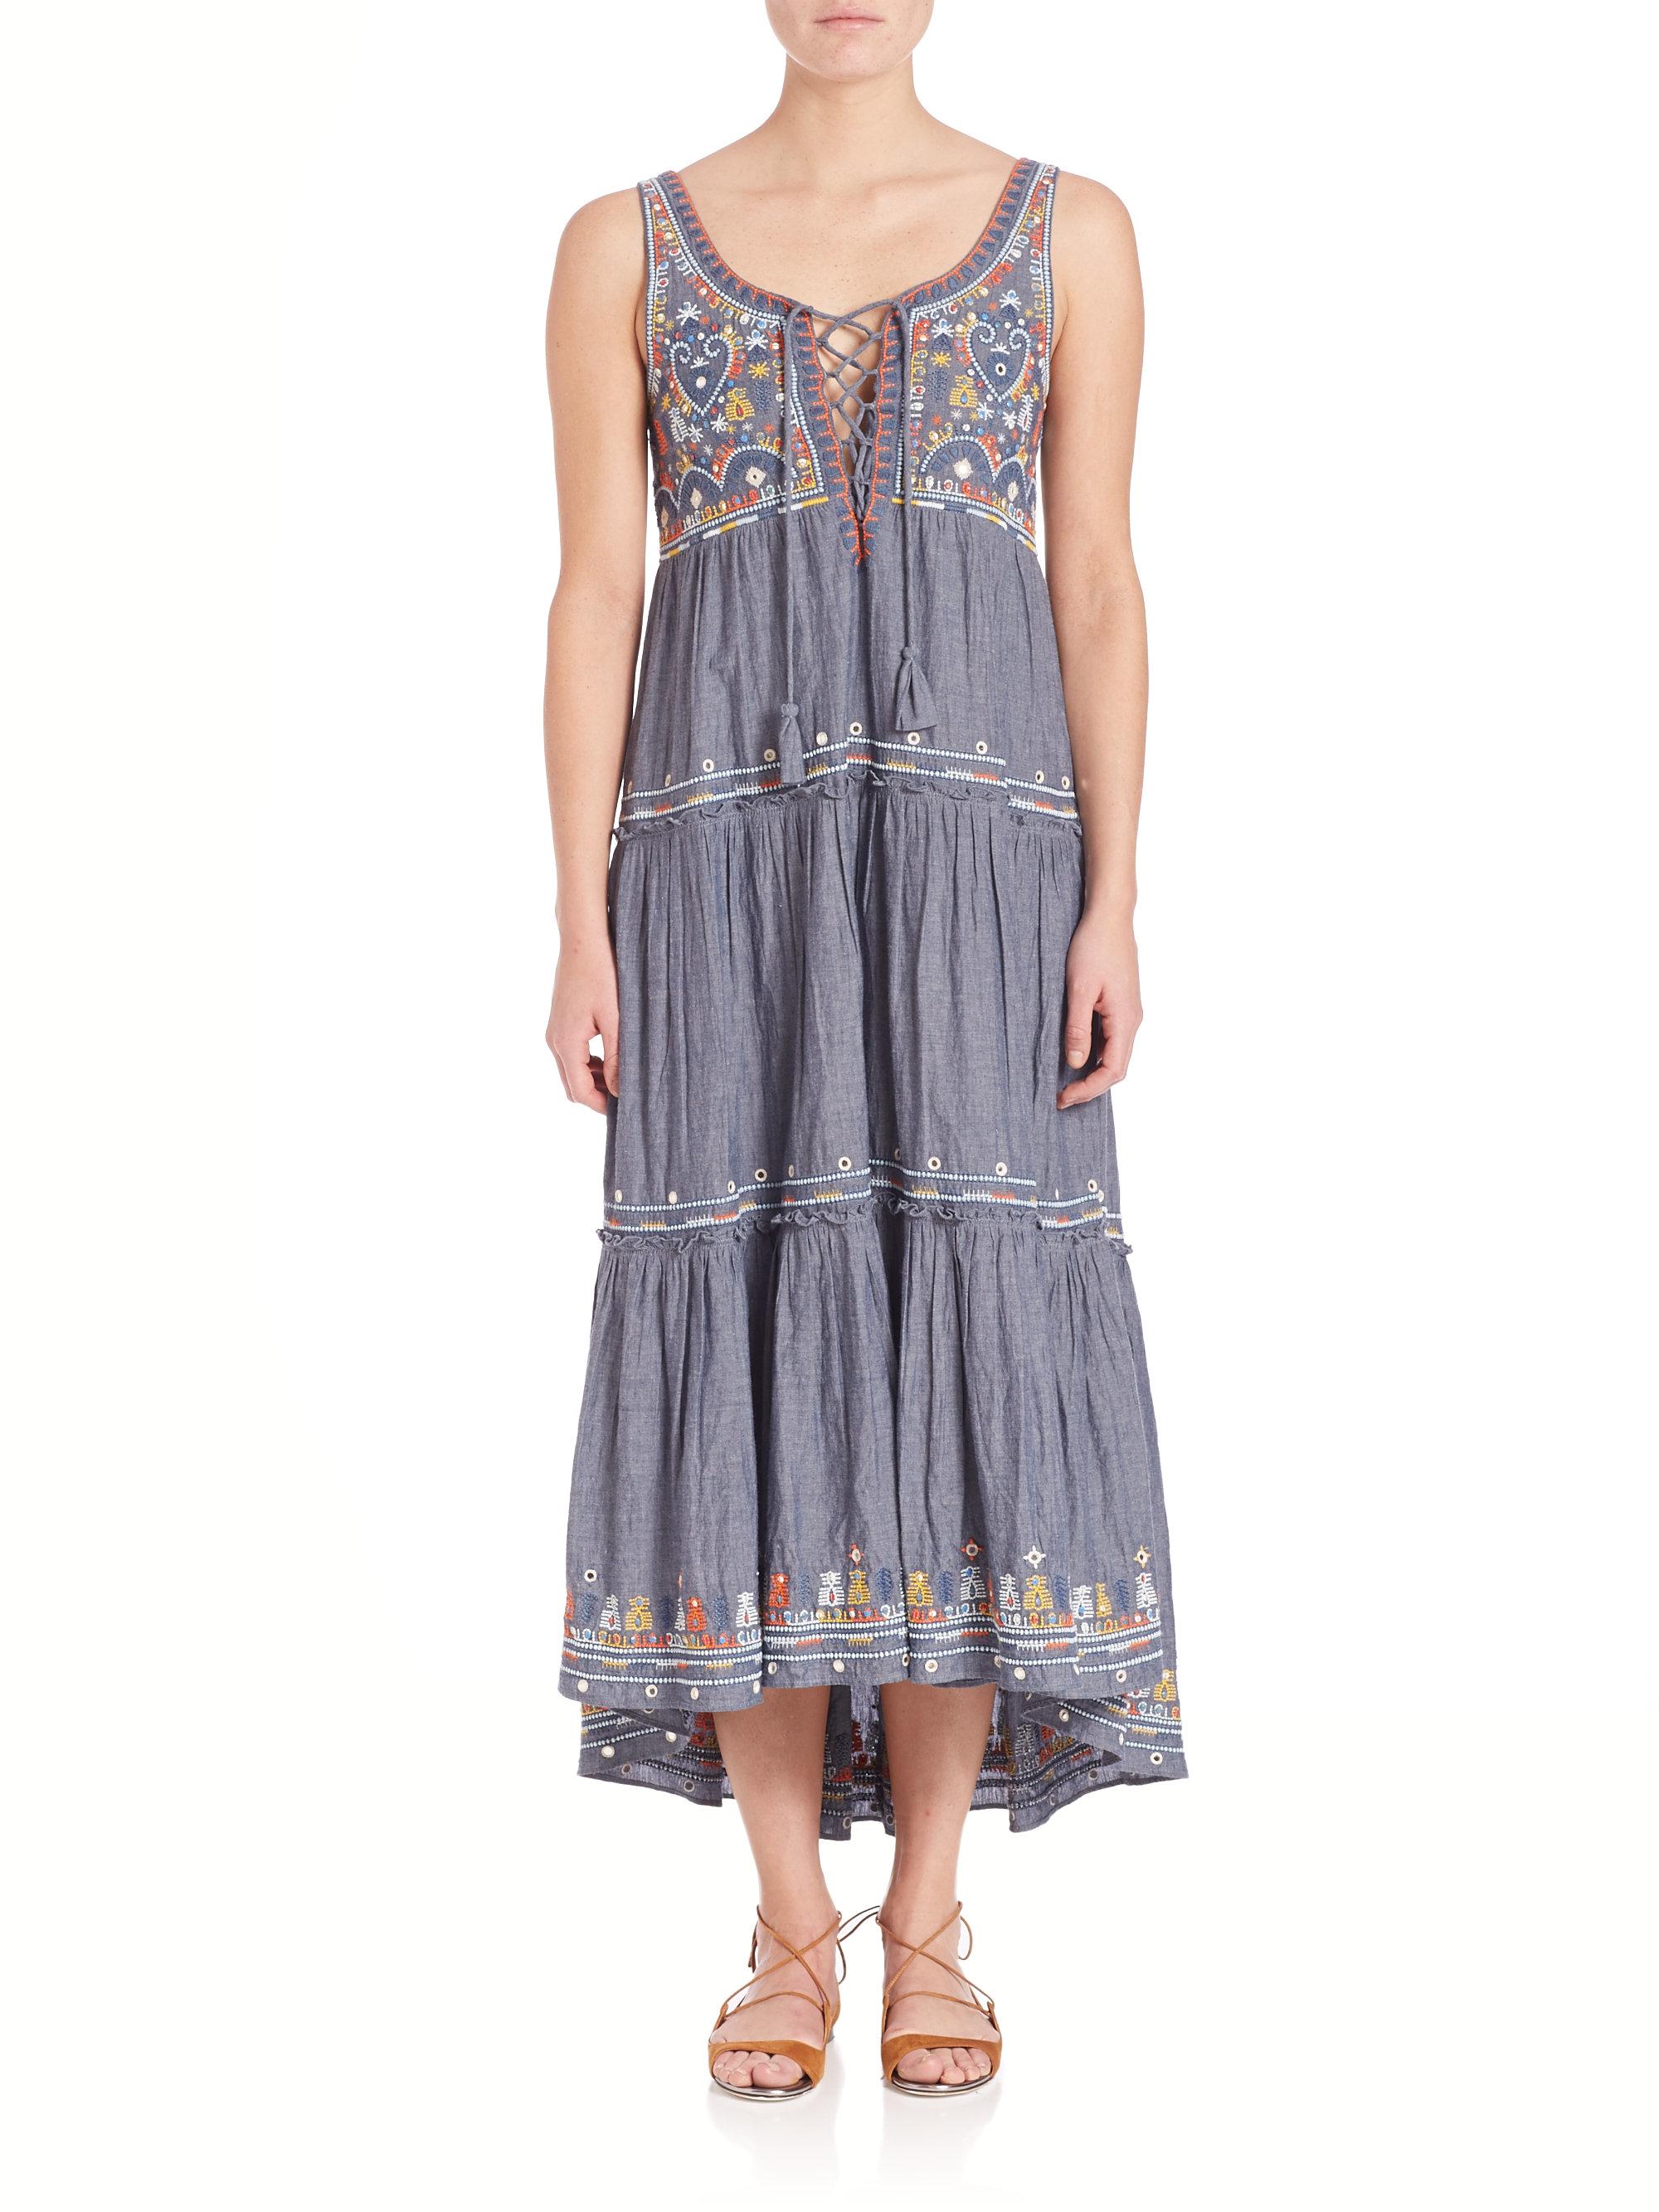 Lyst Calypso St Barth Jimena Embroidered Chambray Dress